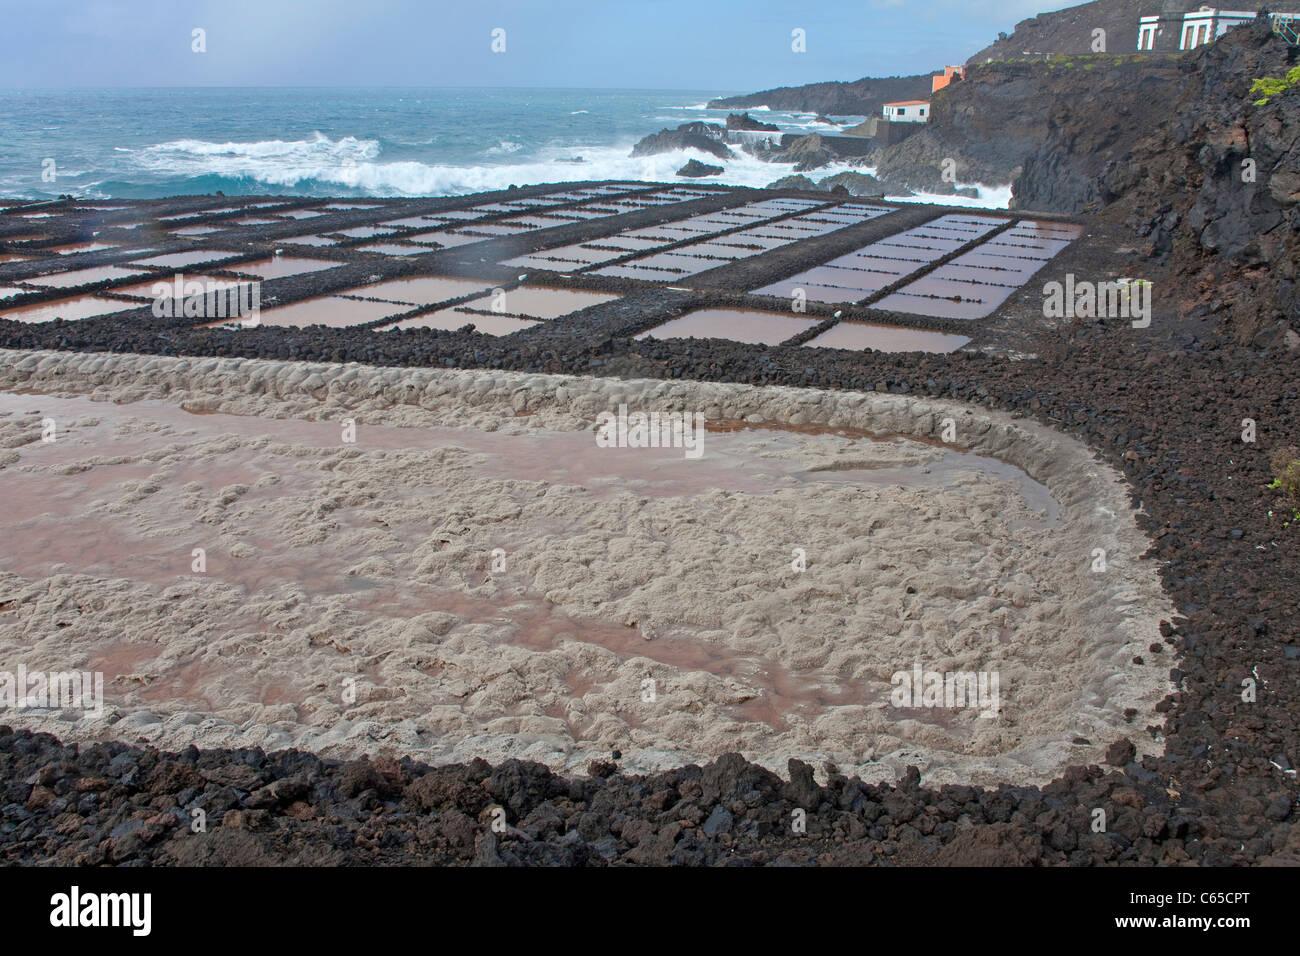 Salinas de Fuencaliente, Kochsalzlösung zum Faro de Fuencaliente, South Coast, La Palma, Kanarische Inseln, Stockbild